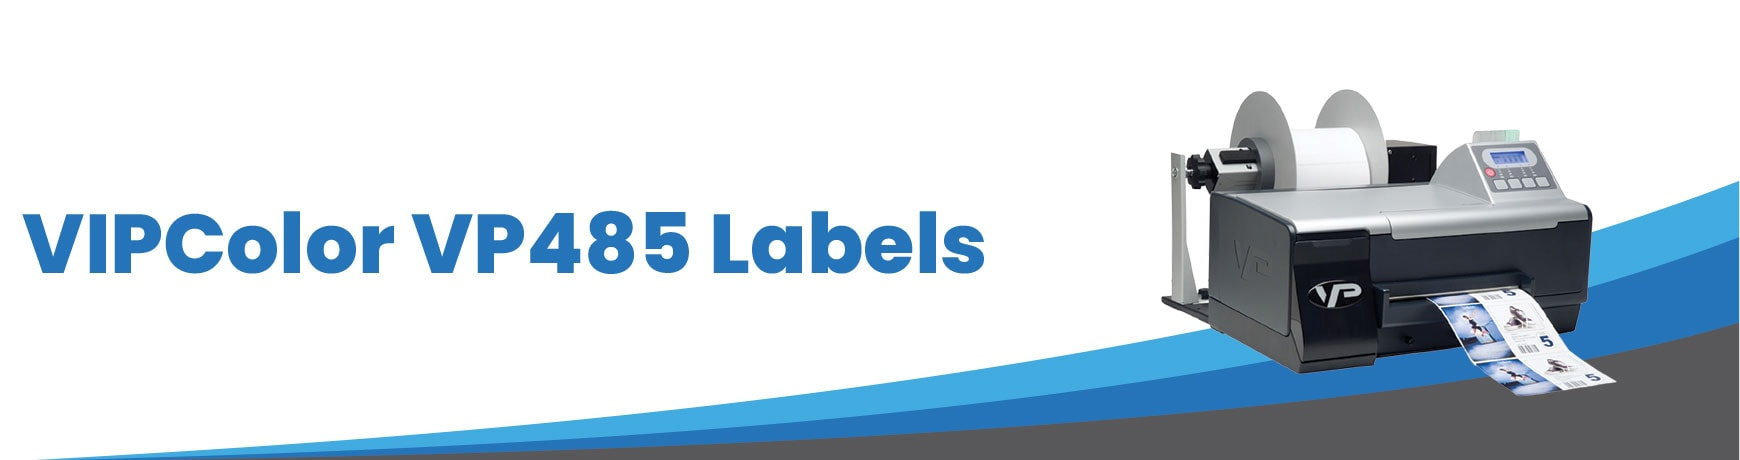 VIPColor VP485 Labels